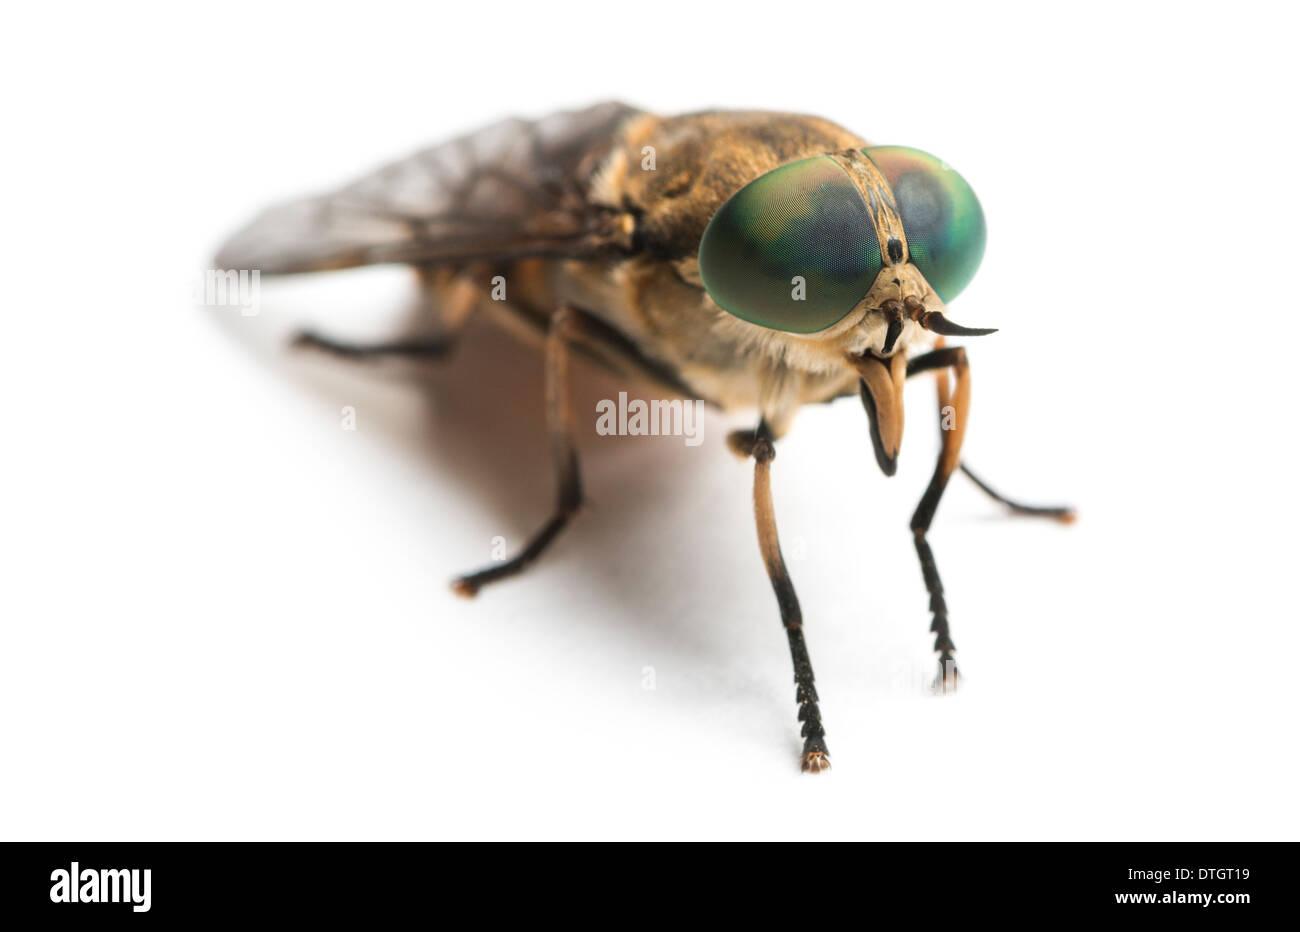 Horsefly, Tabanus, against white background Stock Photo